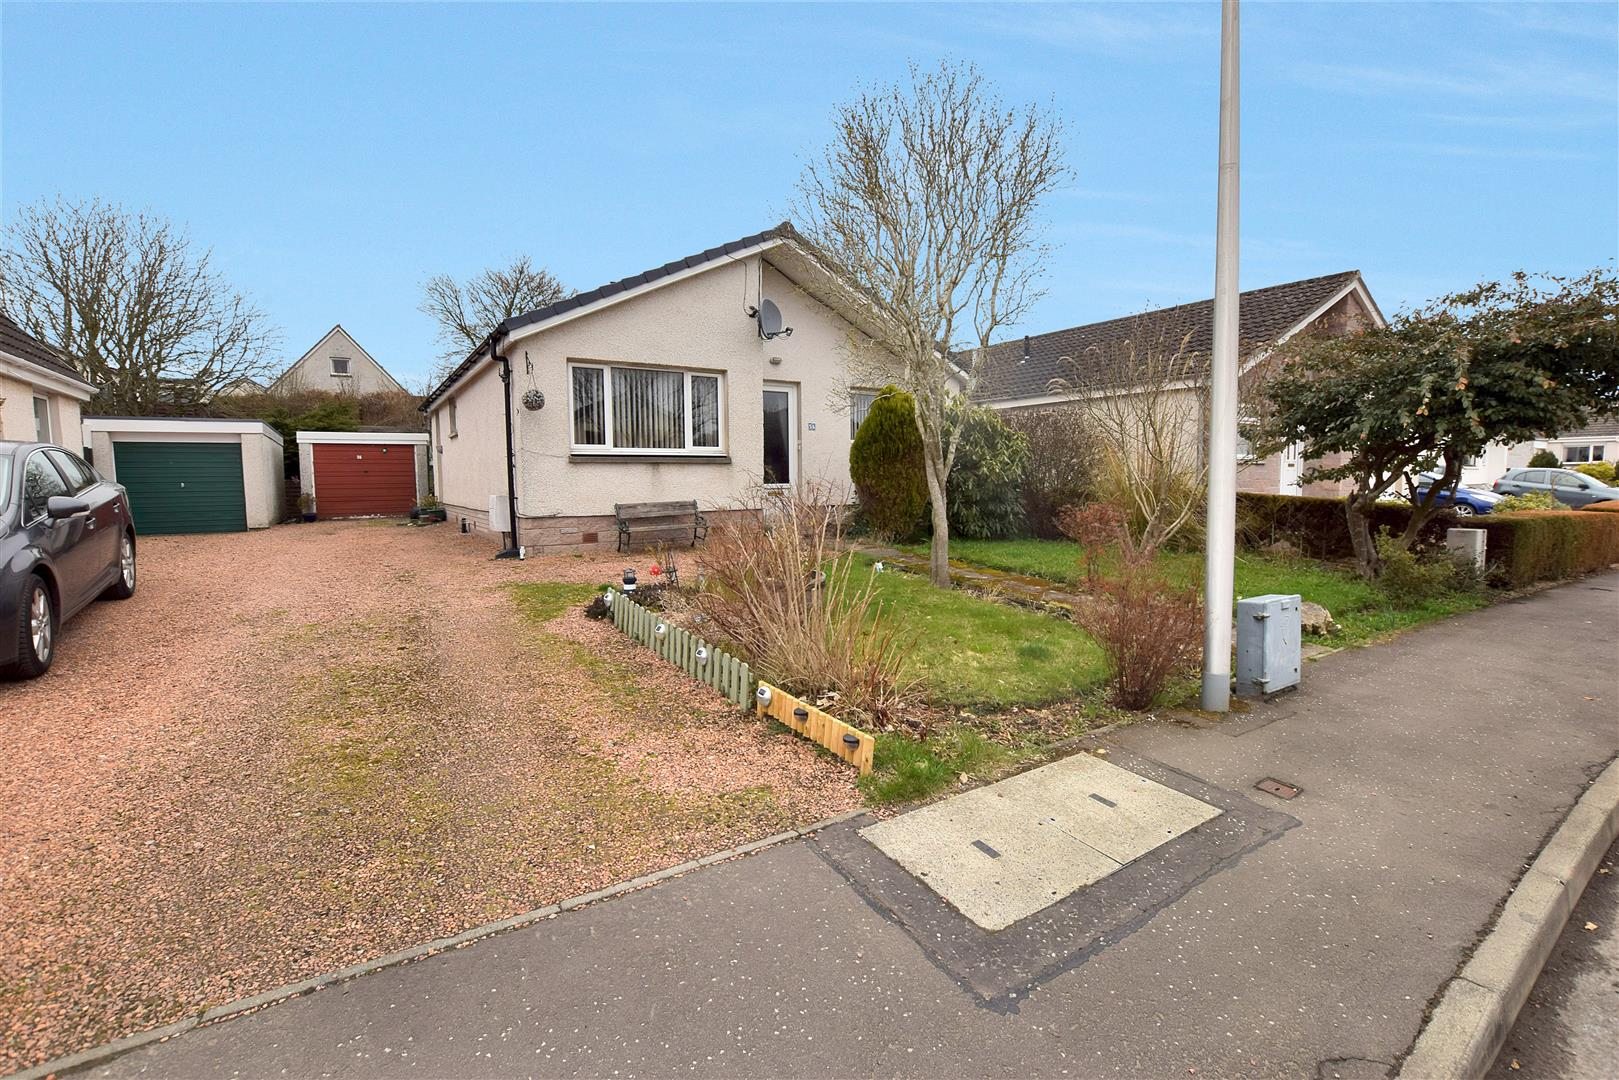 Smithfield Crescent, Blairgowrie, Perthshire, PH10 6UE, UK